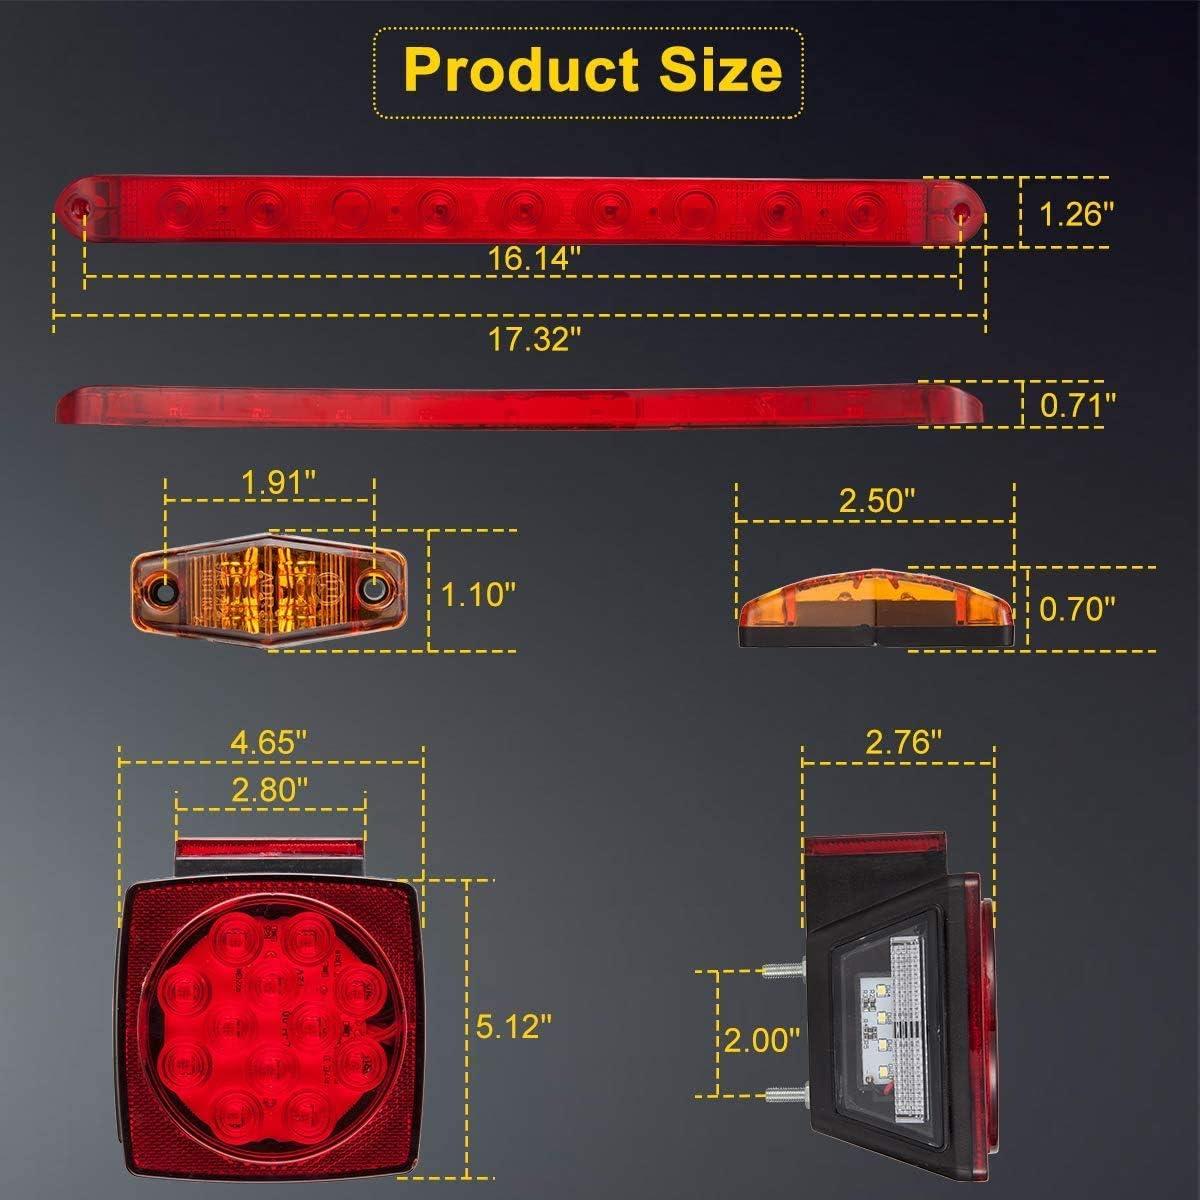 12V LED Trailer Lights Kit Waterproof Square Stop Turn Tail Truck Lights w//Wire Harness /& Bracket Red//Amber Side Fender Marker Lamps 3rd Brake ID Light Bar for Trailer Boat Camper Snowmobile RV